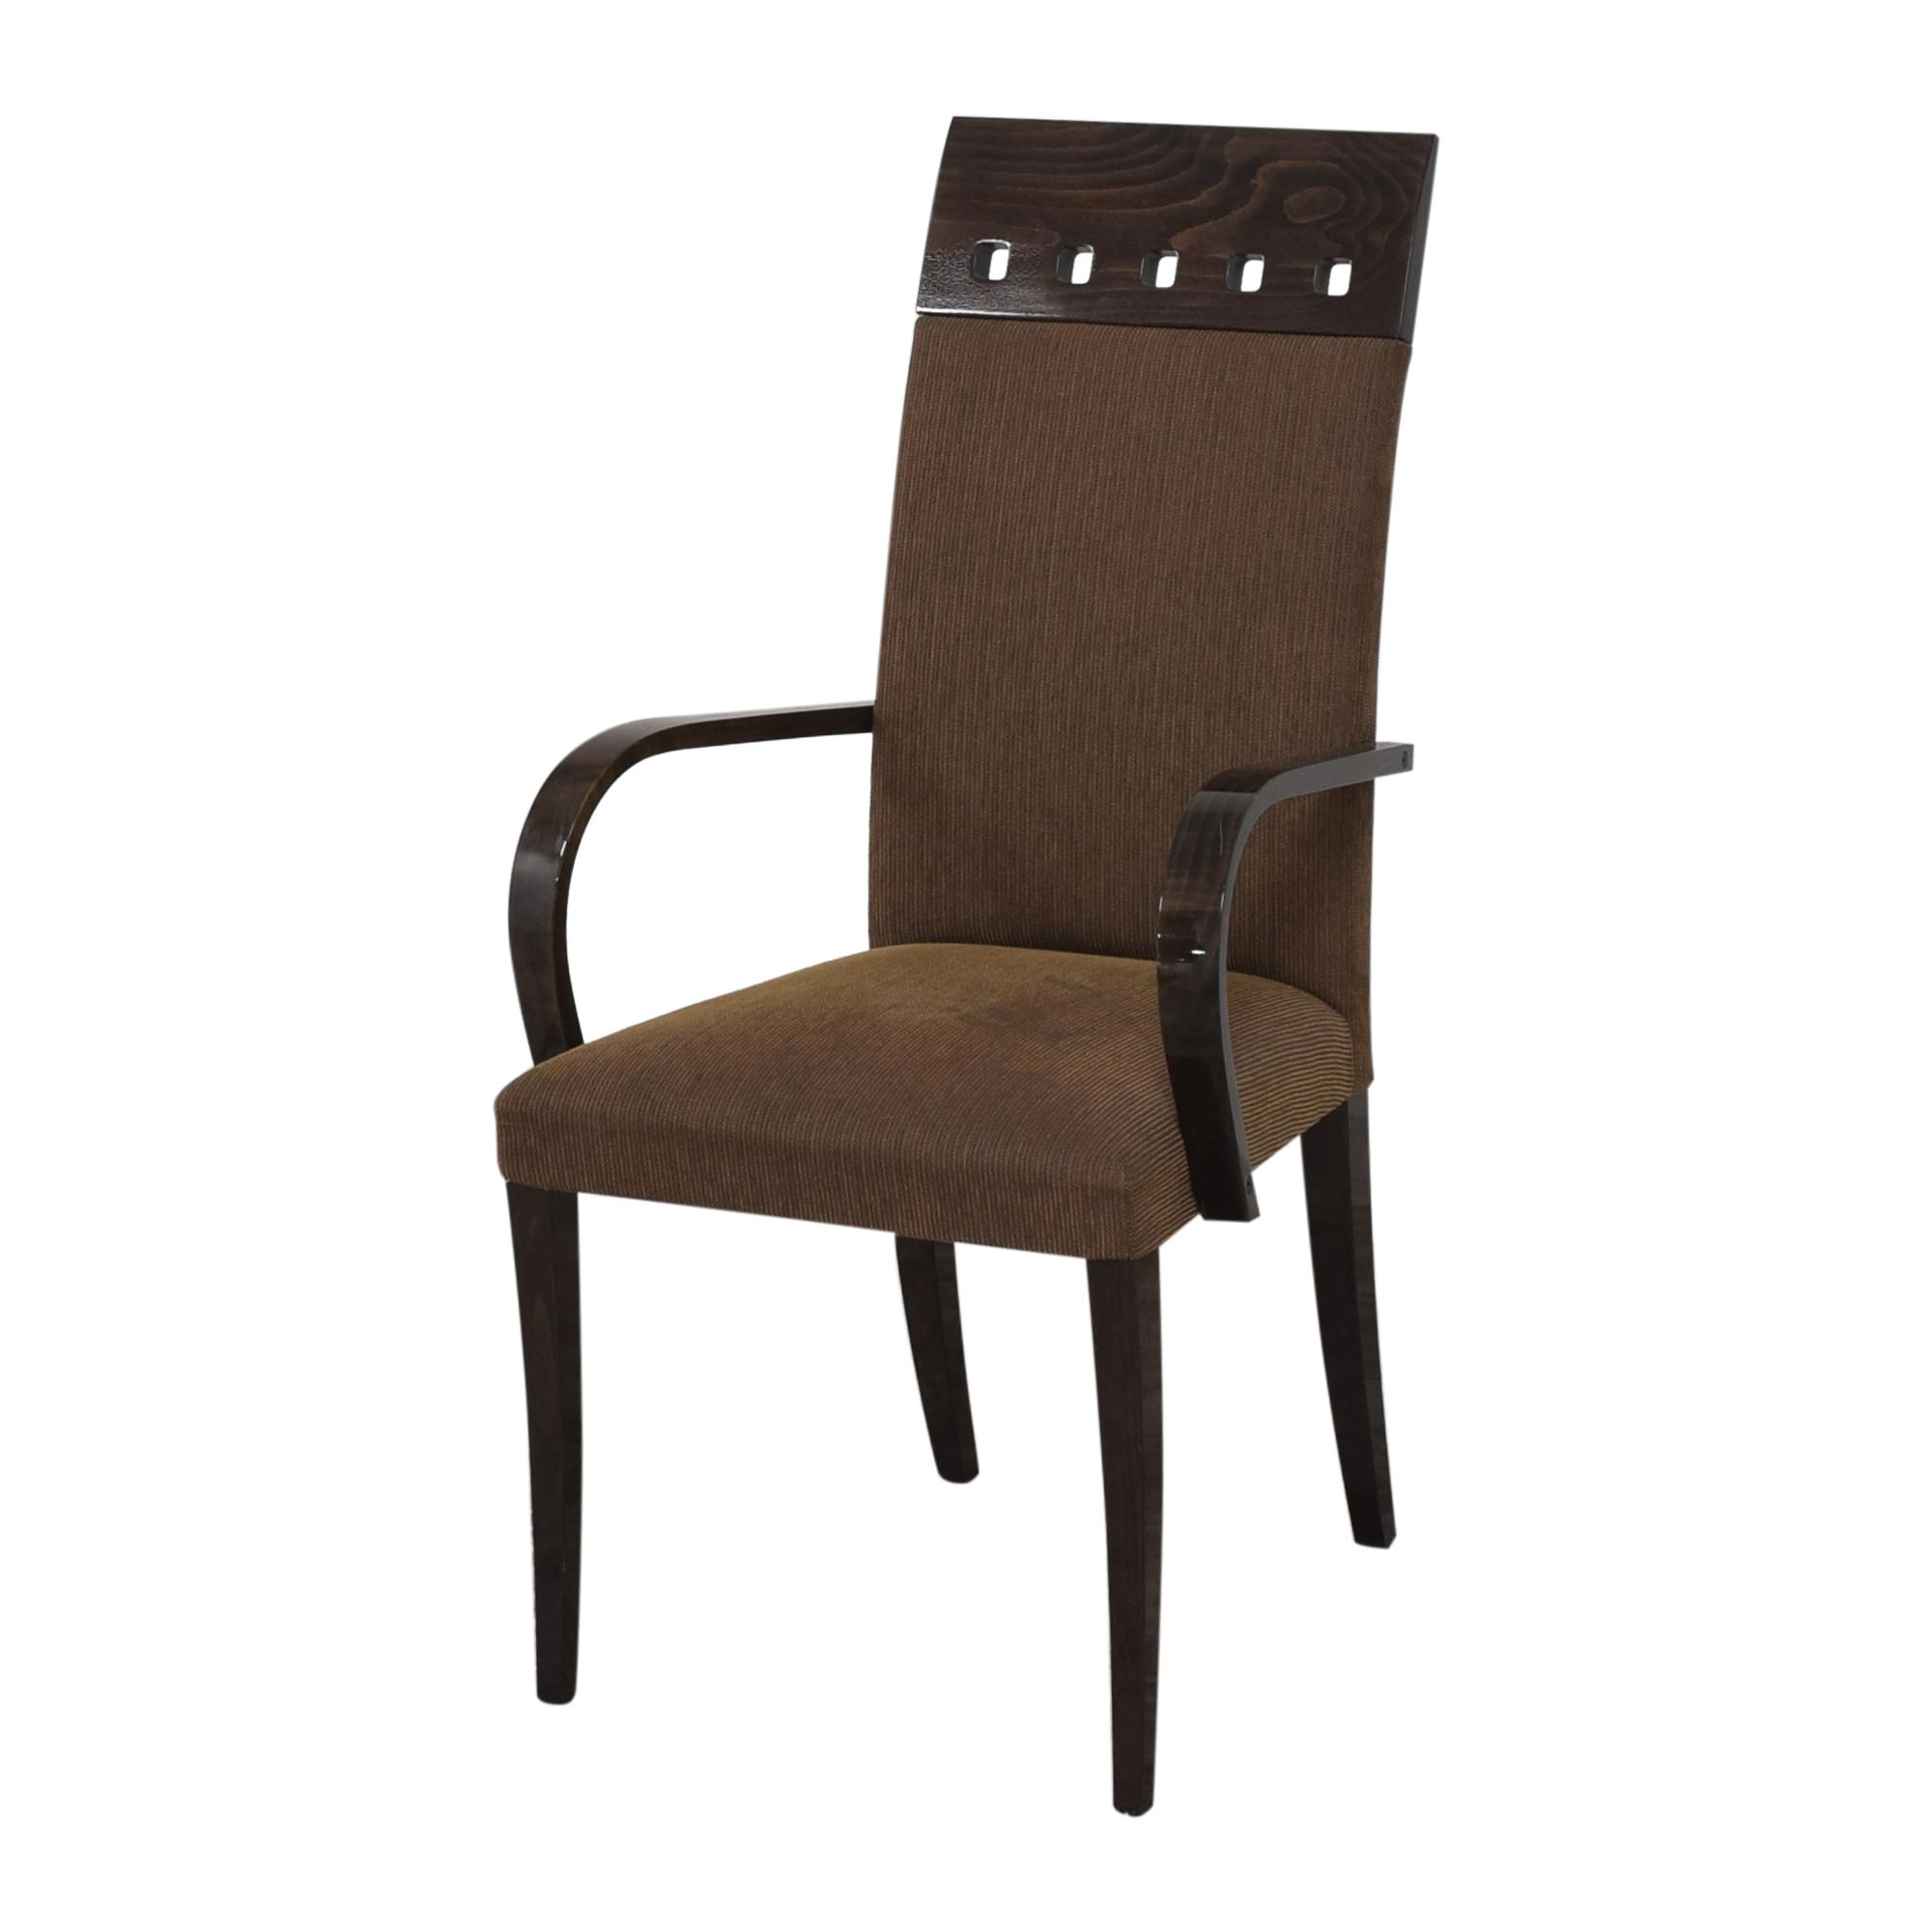 Pietro Costantini Pietro Costantini High Back Dining Arm Chairs ma